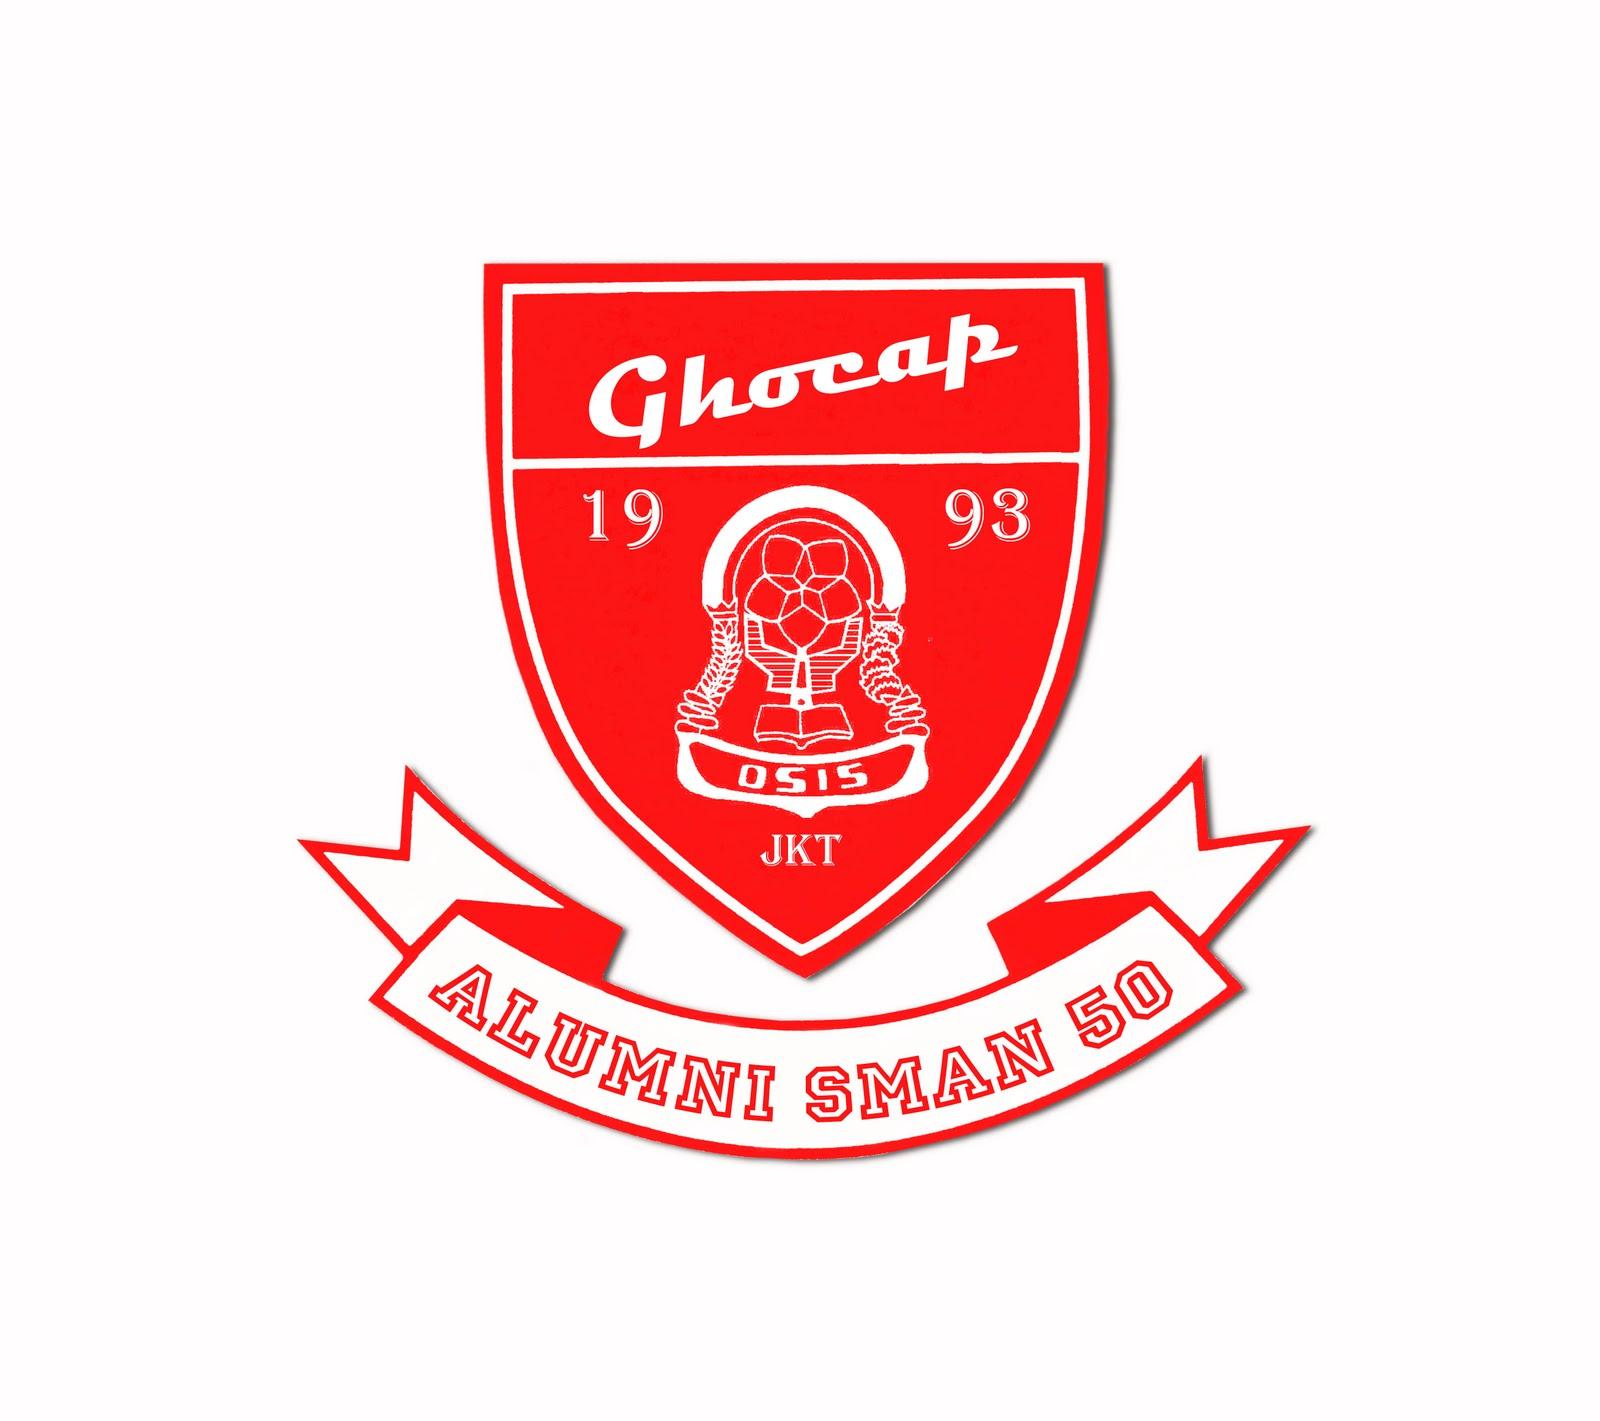 Alumni SMA 50 Kelulusan tahun 1993